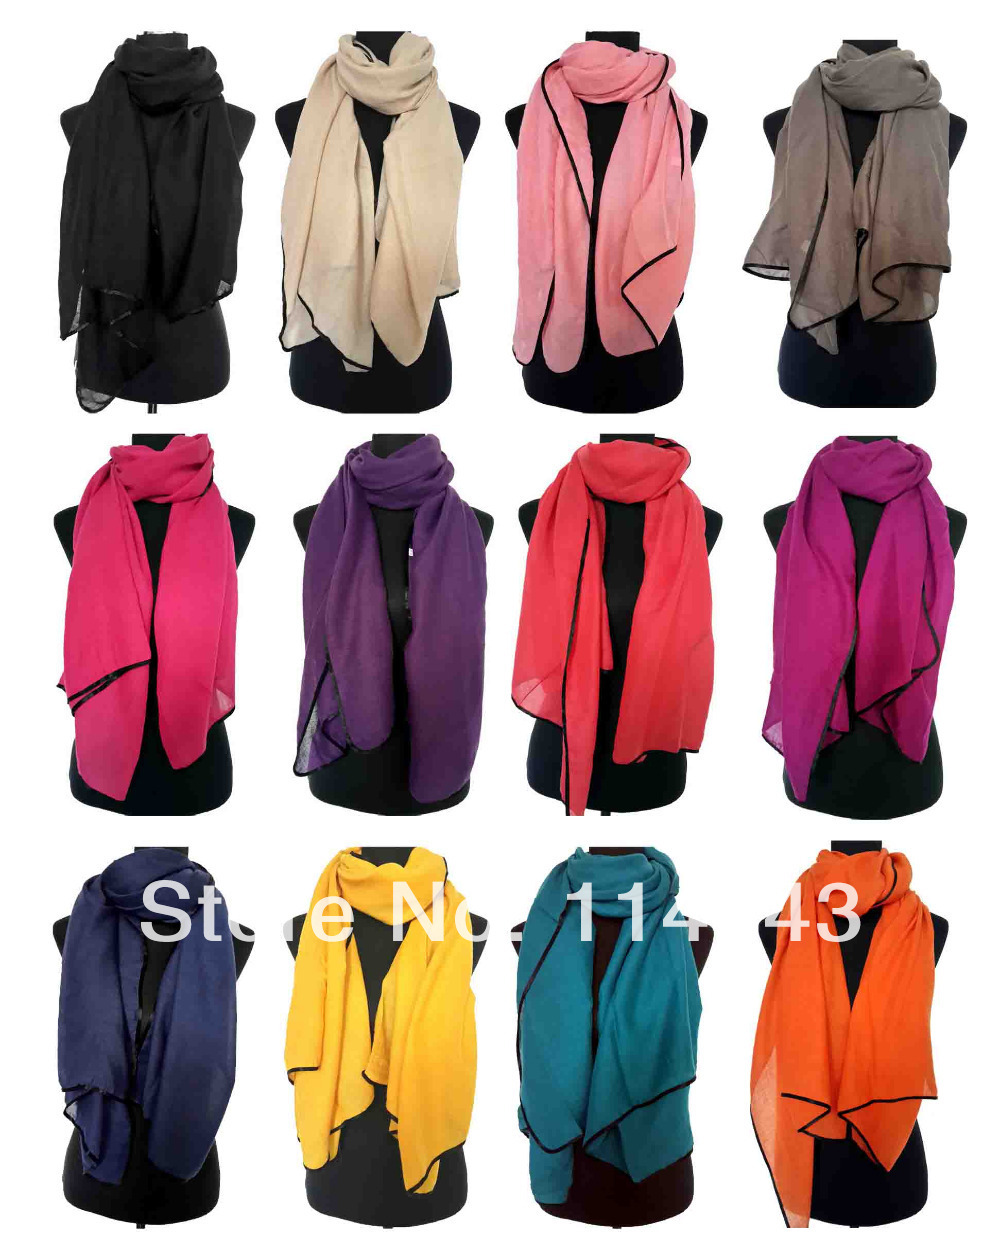 10pcs/lot Fashion Solid Plain Color Twill Scarf Shawl Wrap Hijab Muslim Accessories Black Border, Free Shipping(China (Mainland))